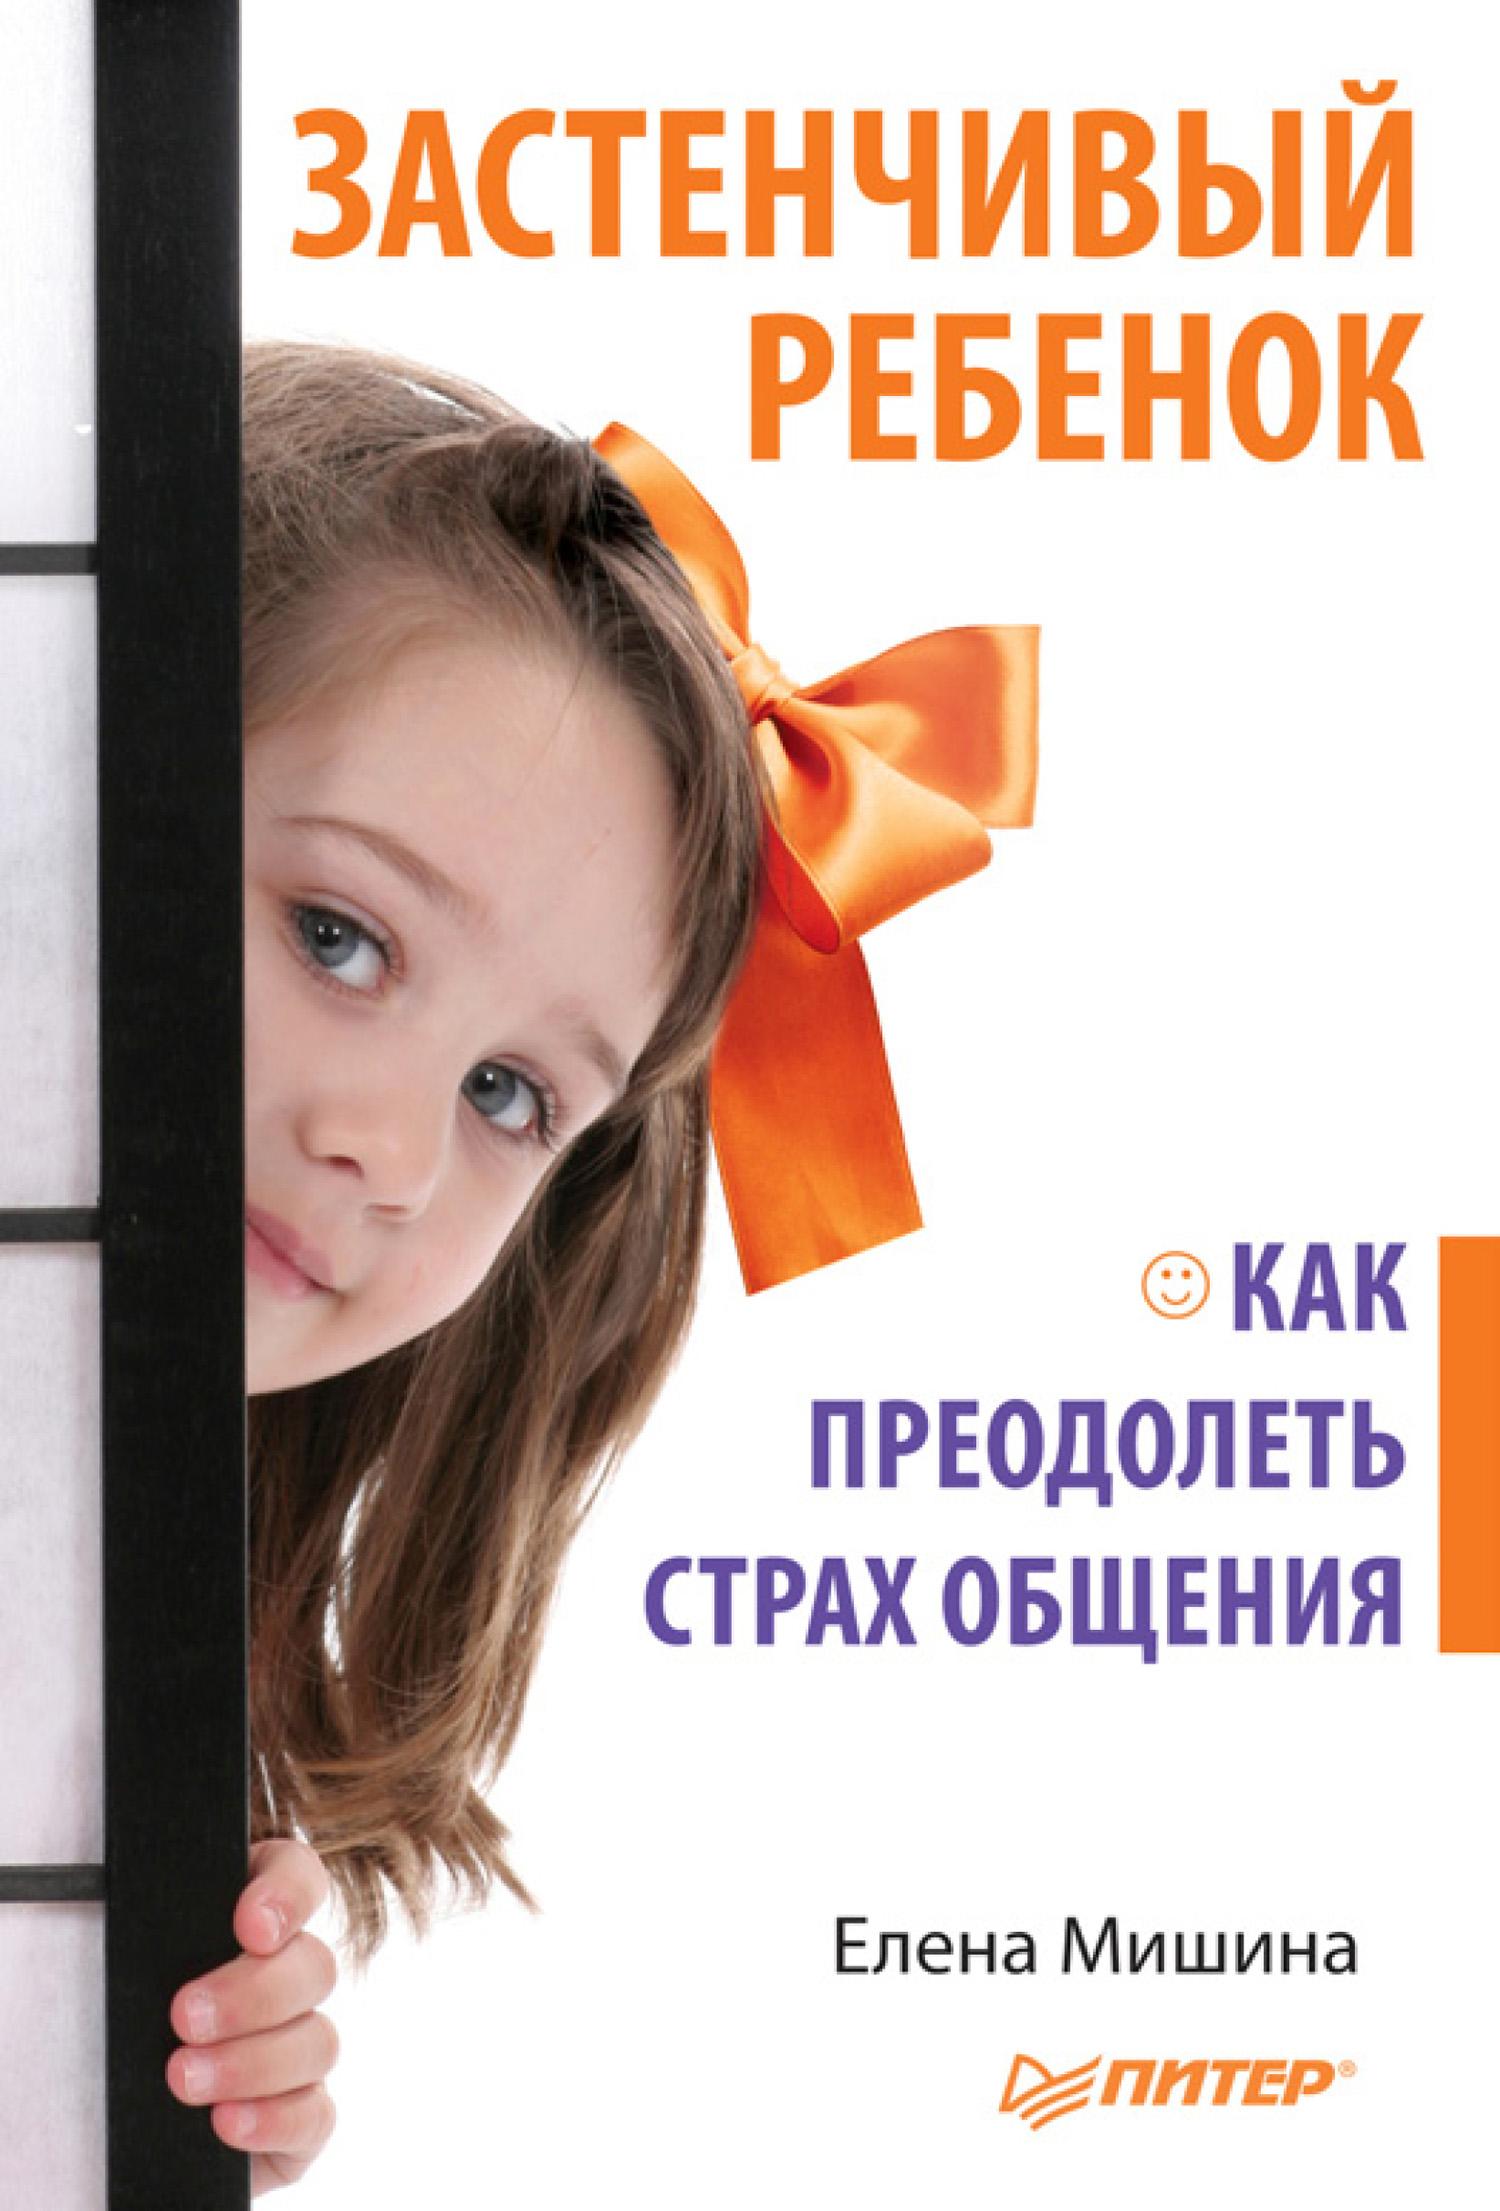 Елена Мишина Застенчивый ребенок. Как преодолеть страх общения цена и фото